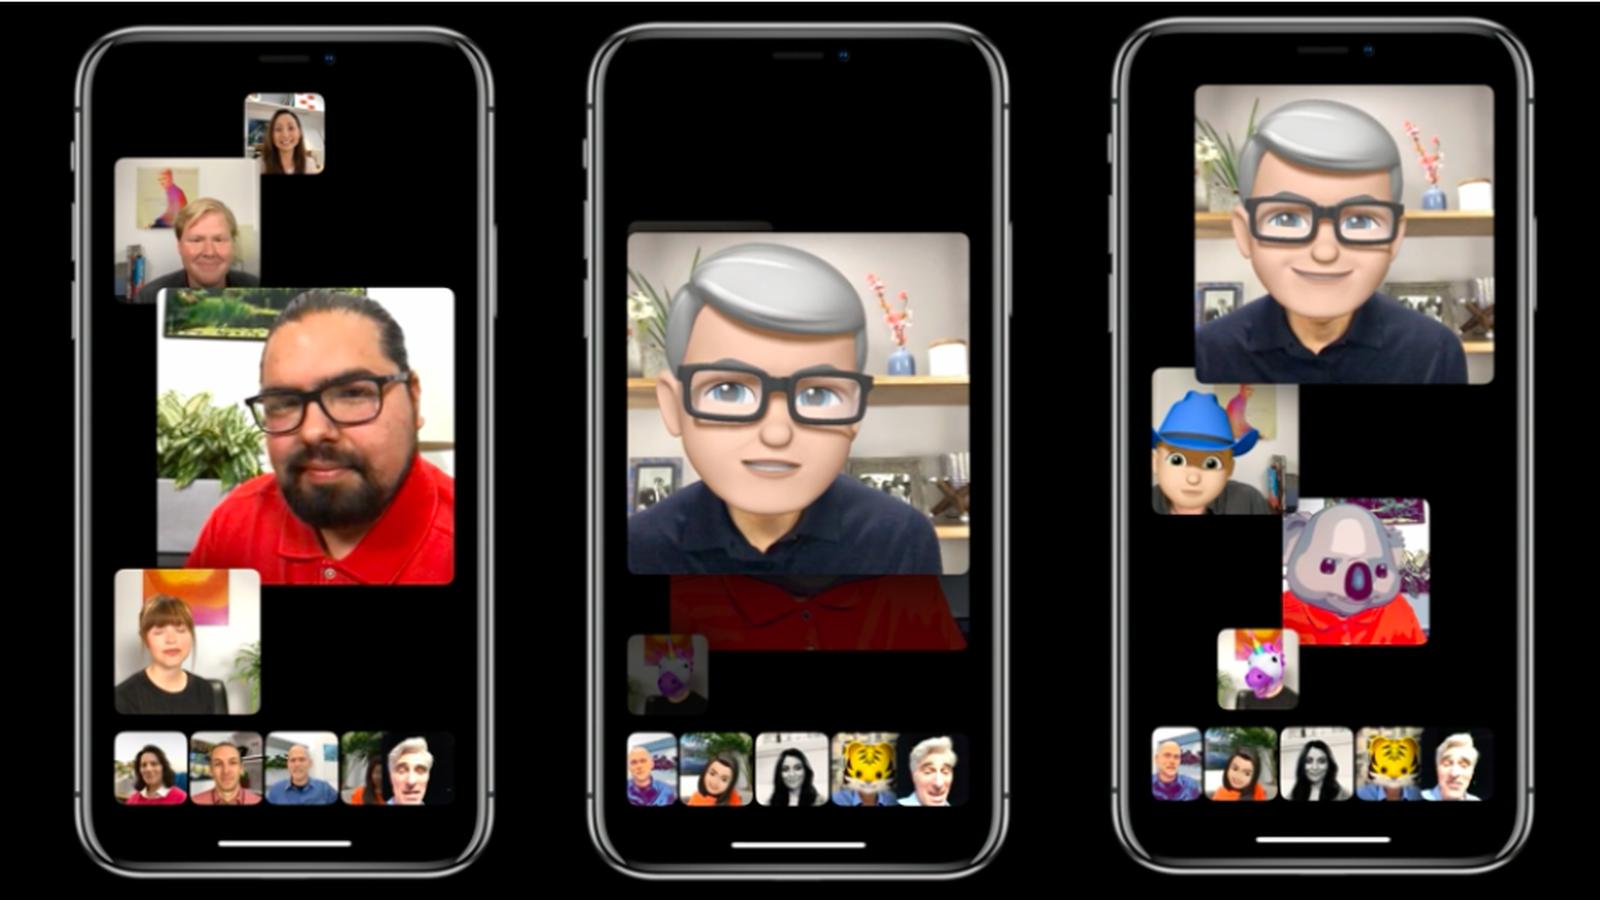 MacOS 10.14.1 beta 1 returned group calls on FaceTime